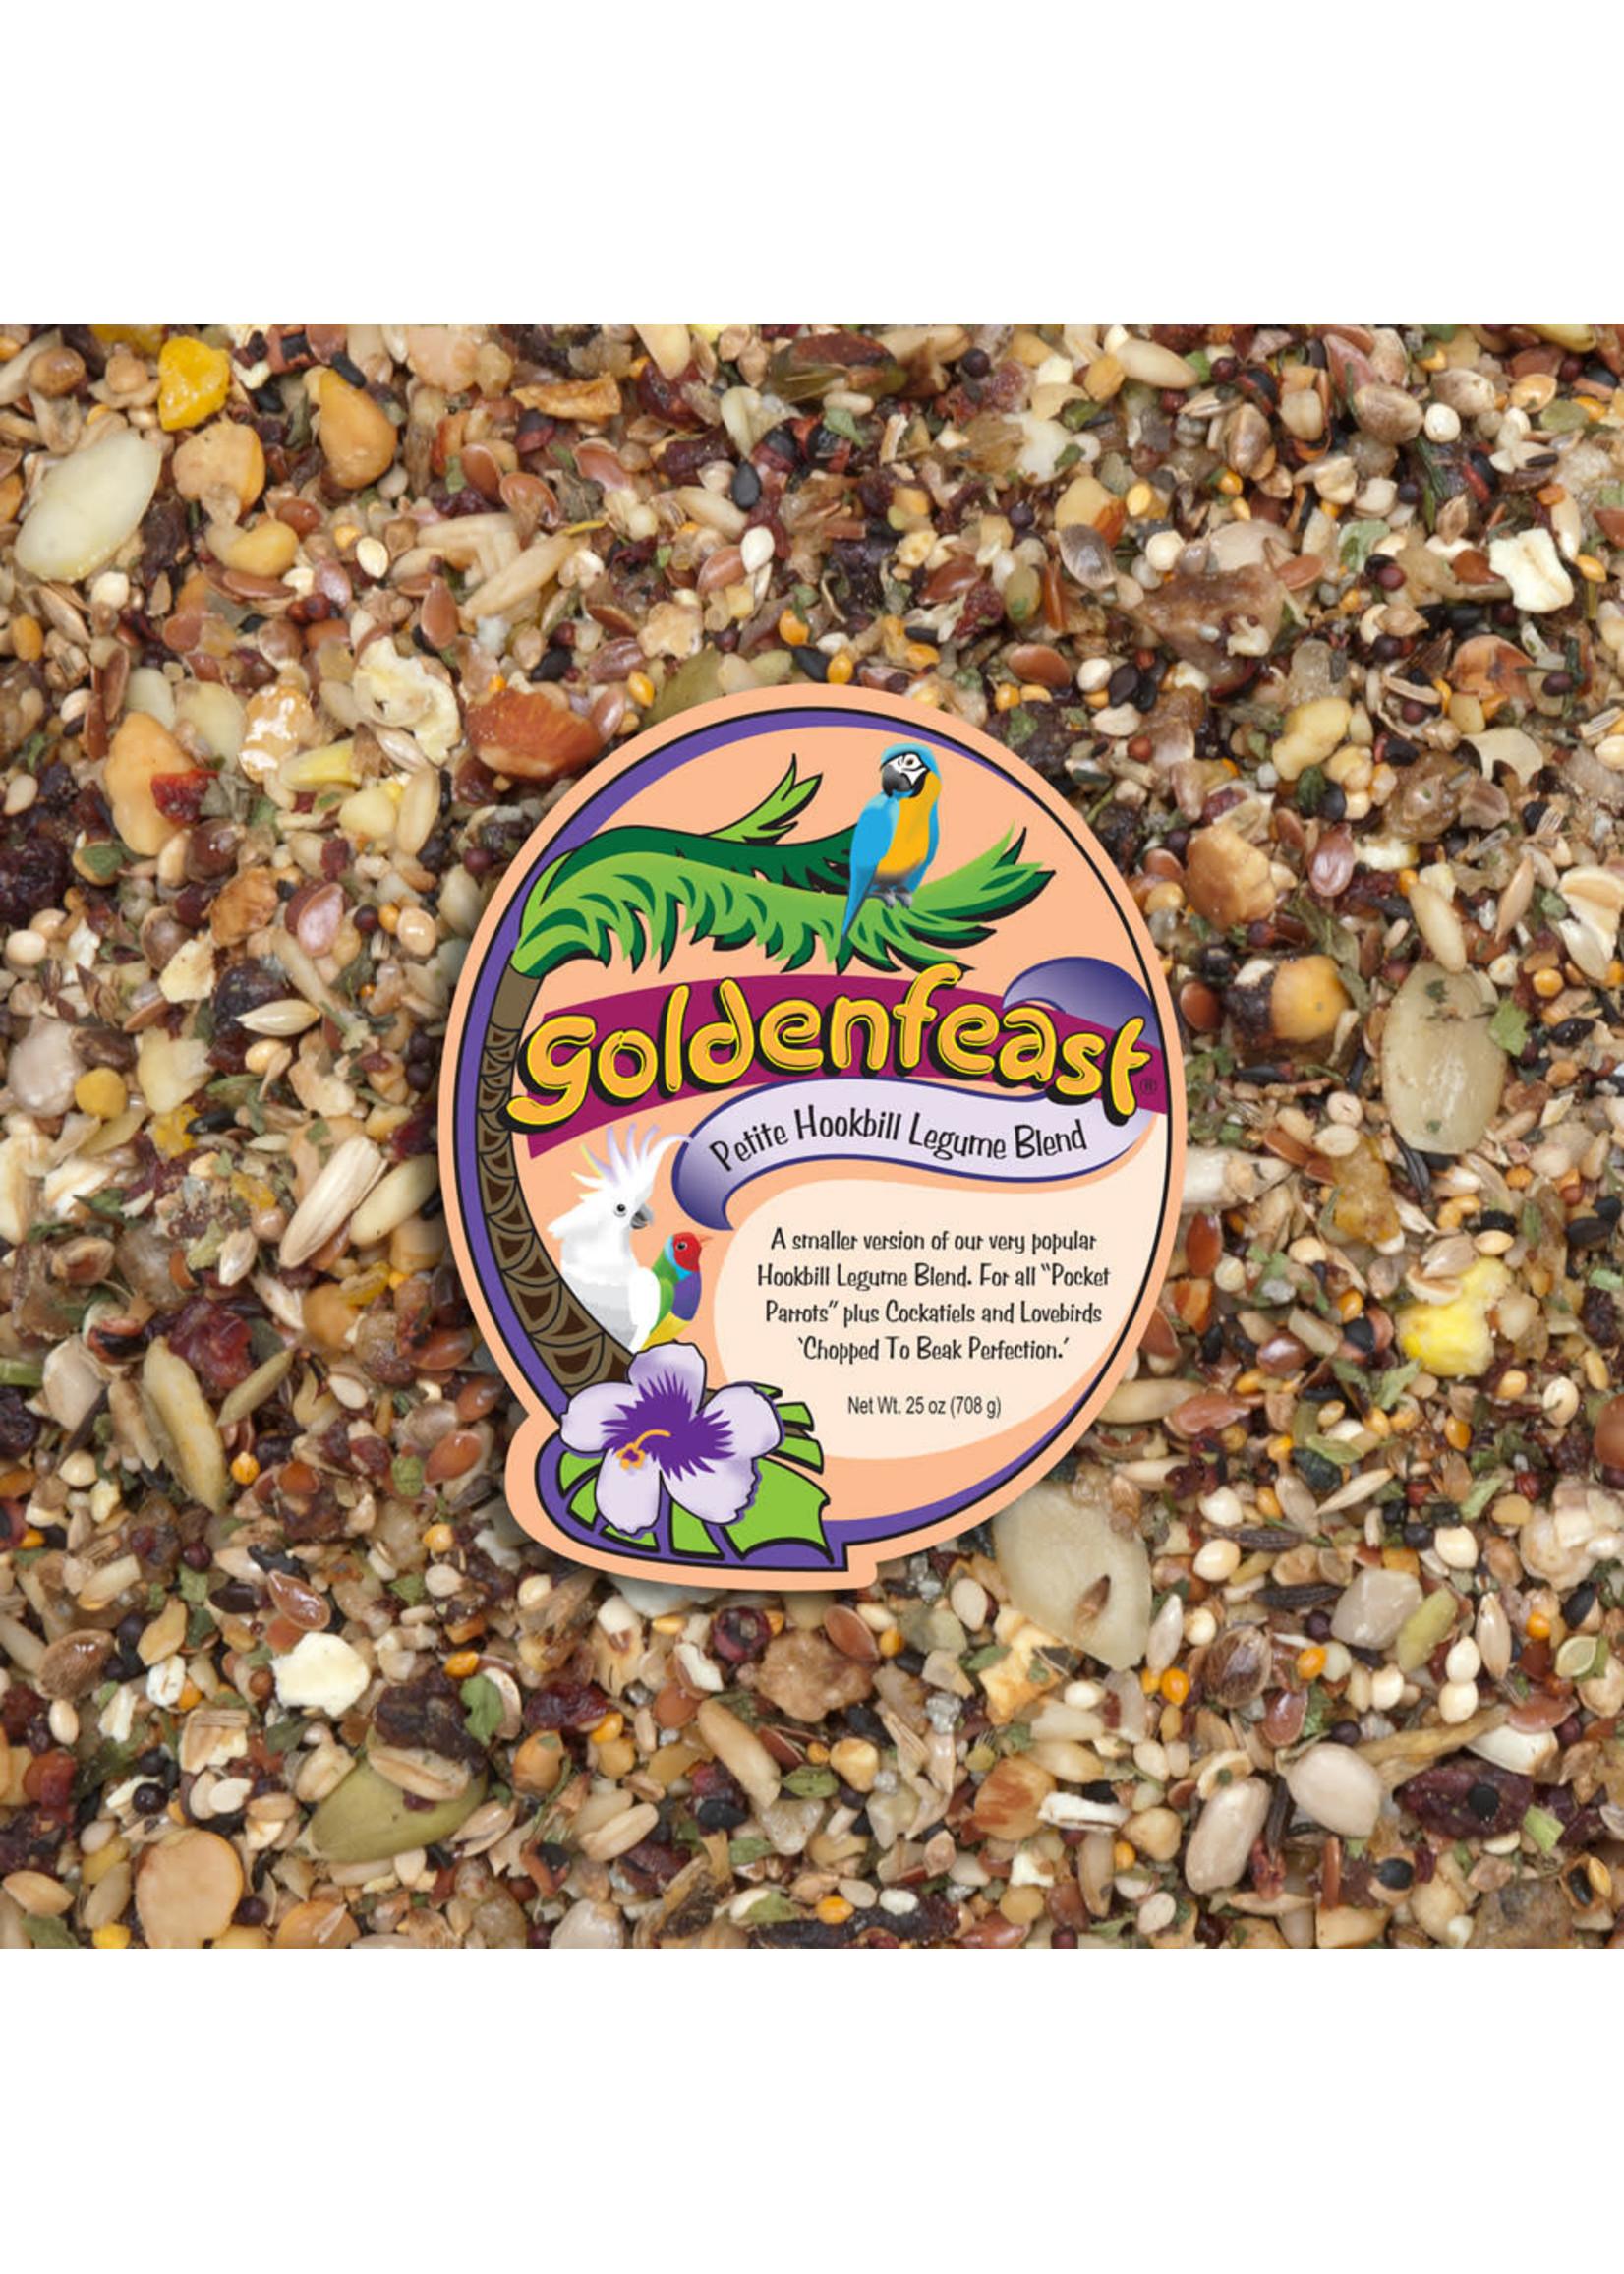 Goldenfeast GF Petite Hookbill Legume Blend (1 LB) 198